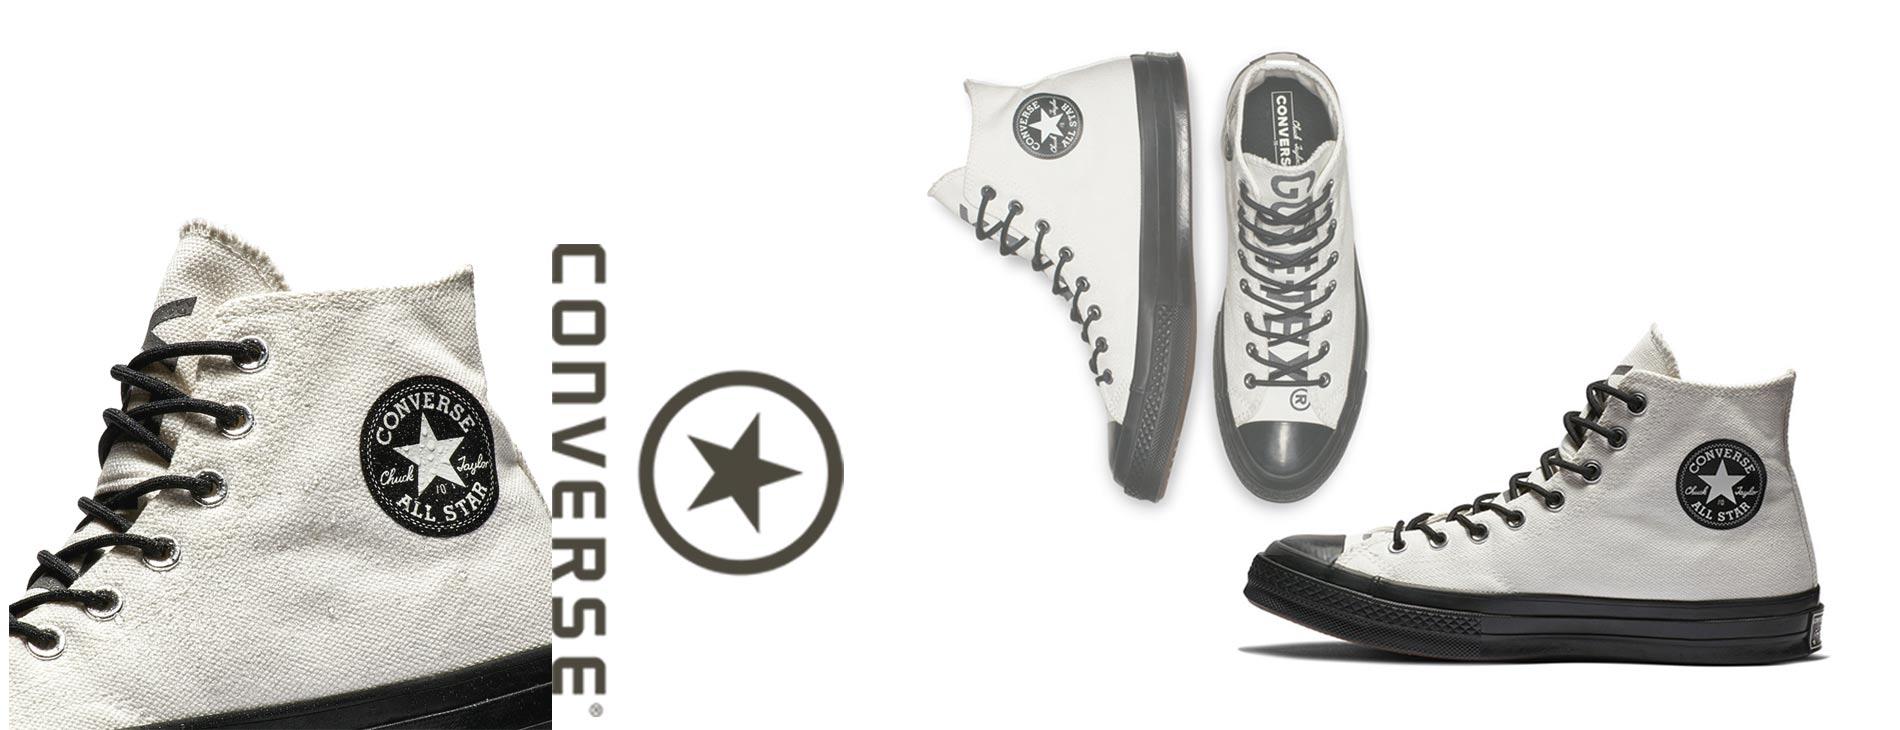 Converse ec8 - کانورس ( آل استار)